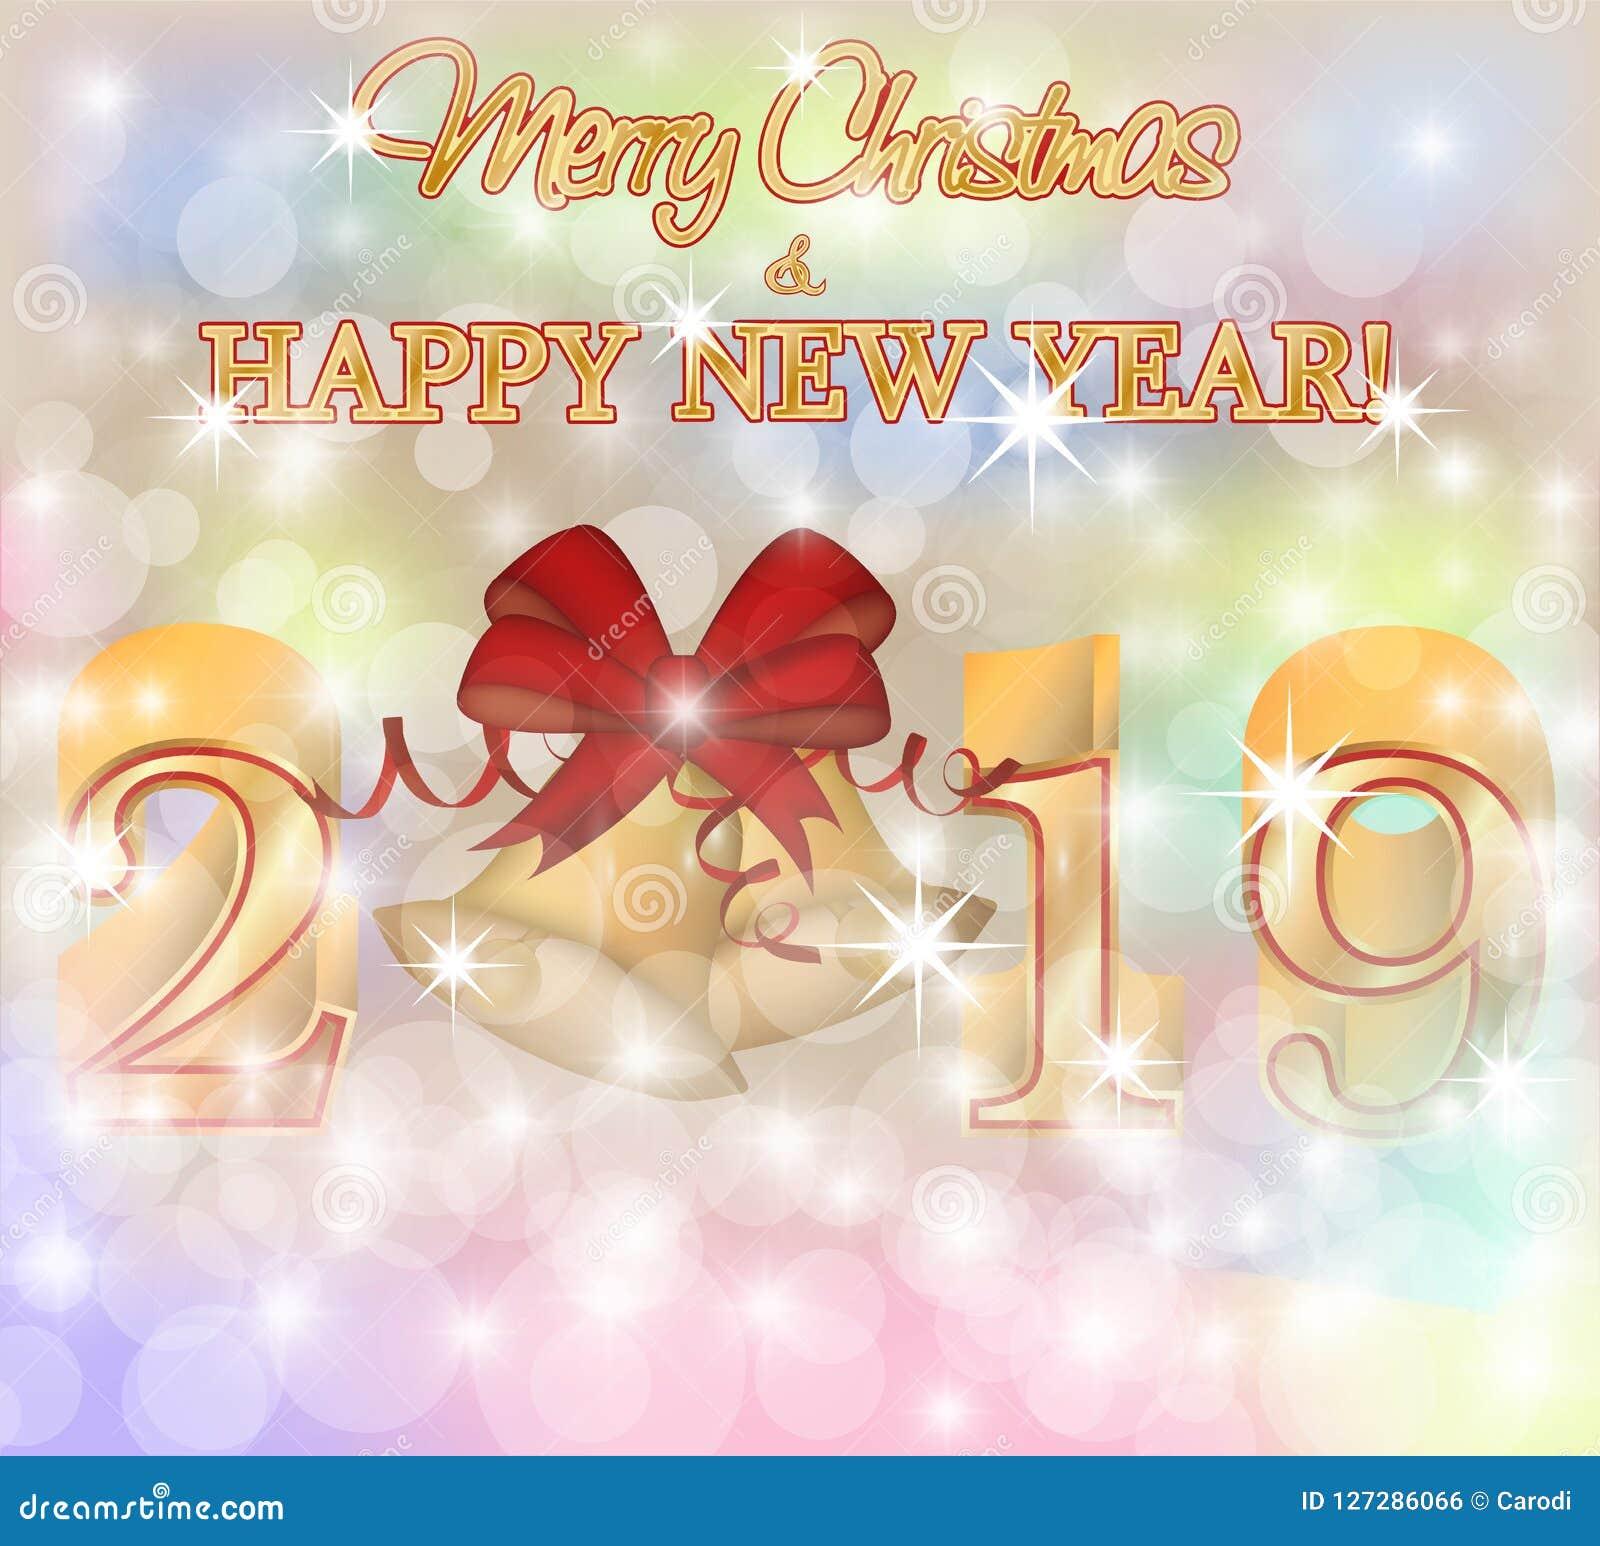 Merry Christmas Happy 2019 New Year Invitation Card Stock